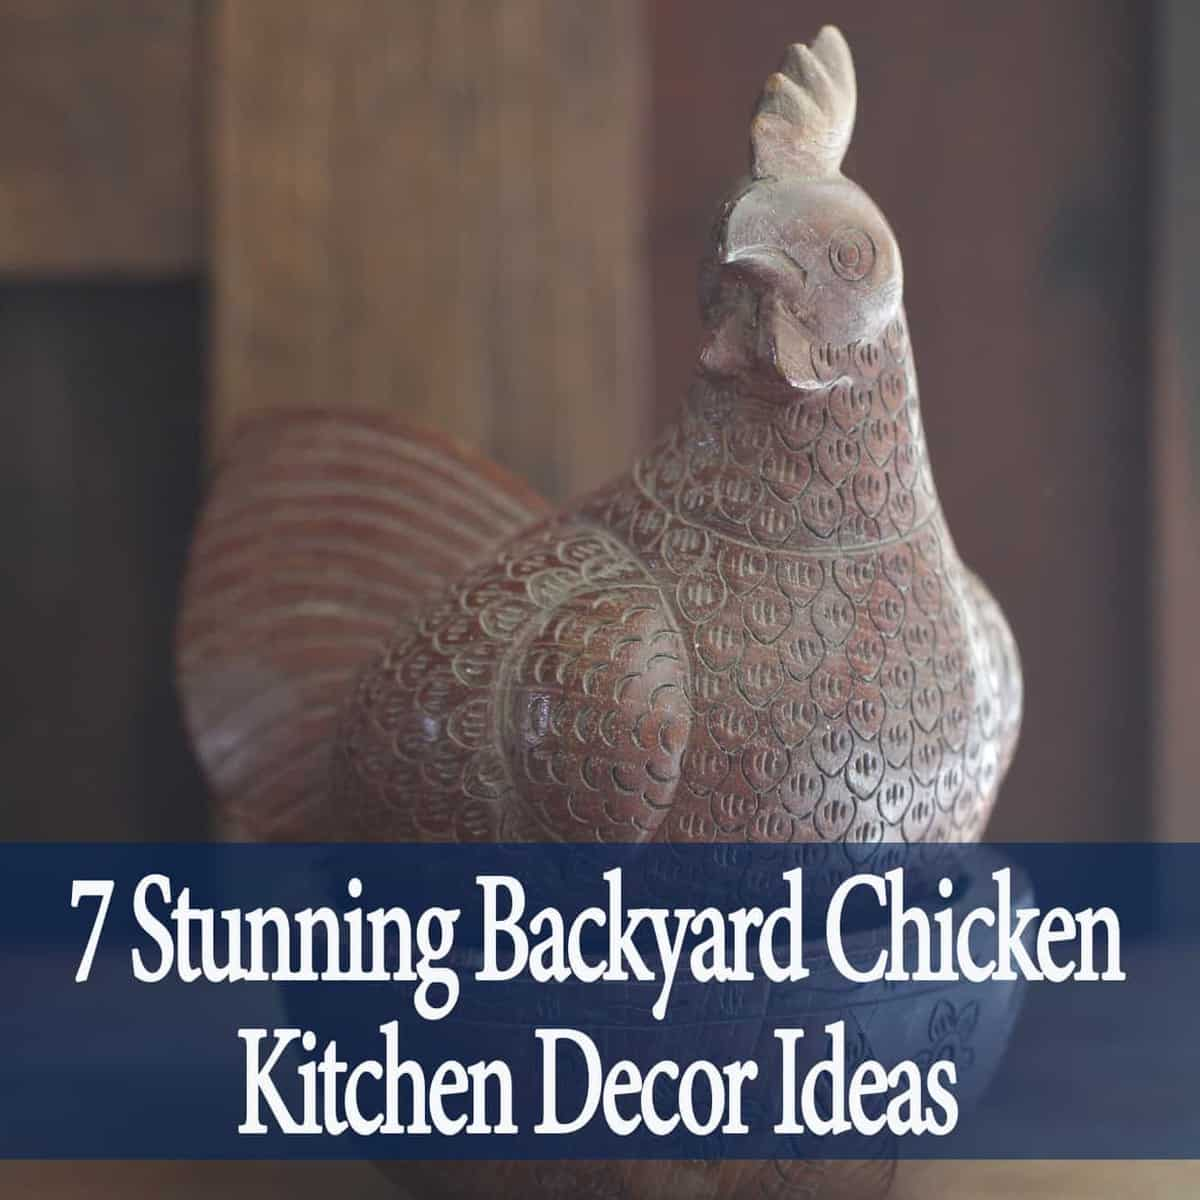 These Backyard Chicken Kitchen Decor Ideas Are Everything